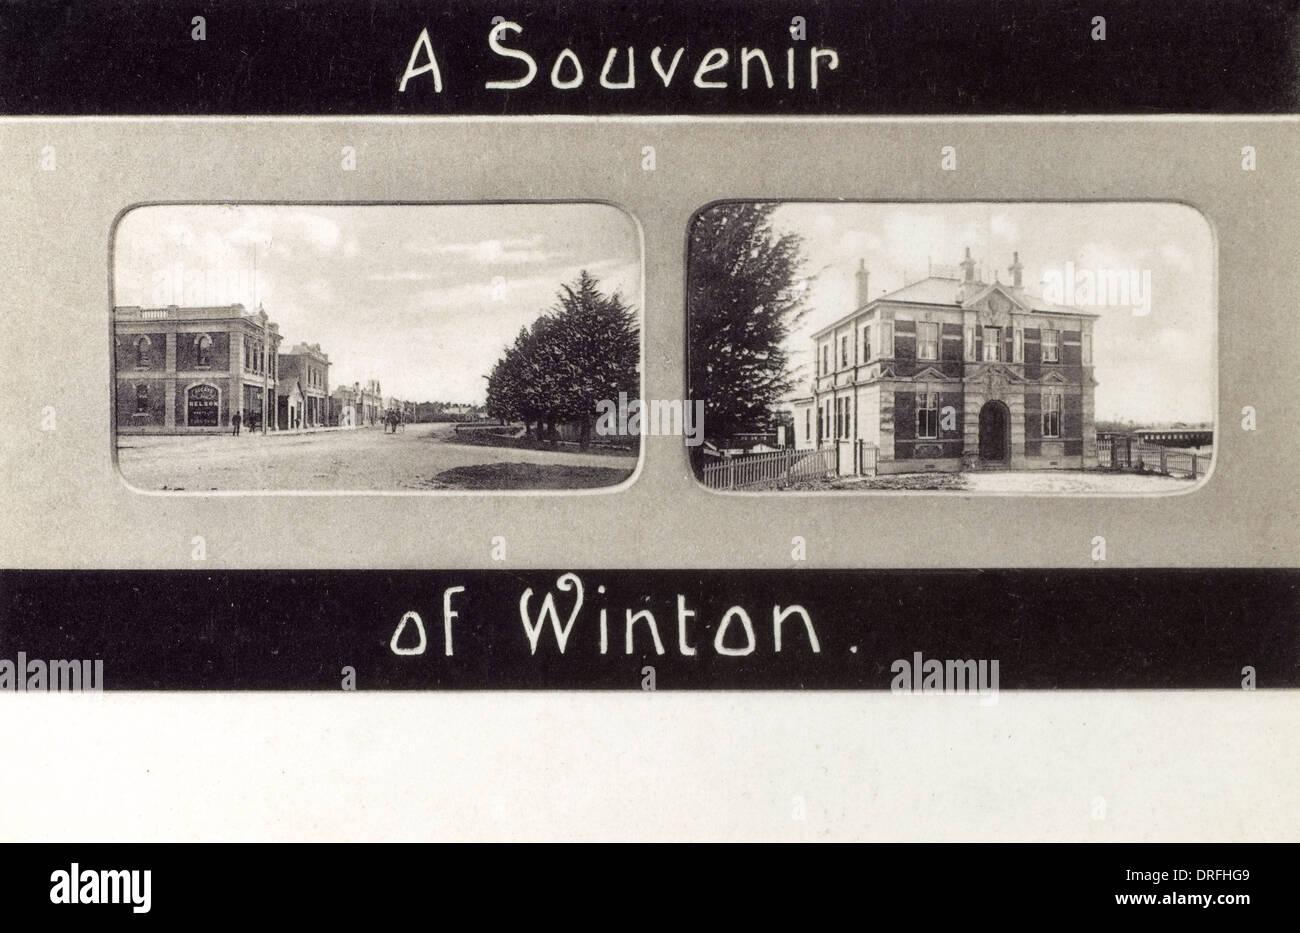 Souvenir of Winston - New Zealand - Stock Image